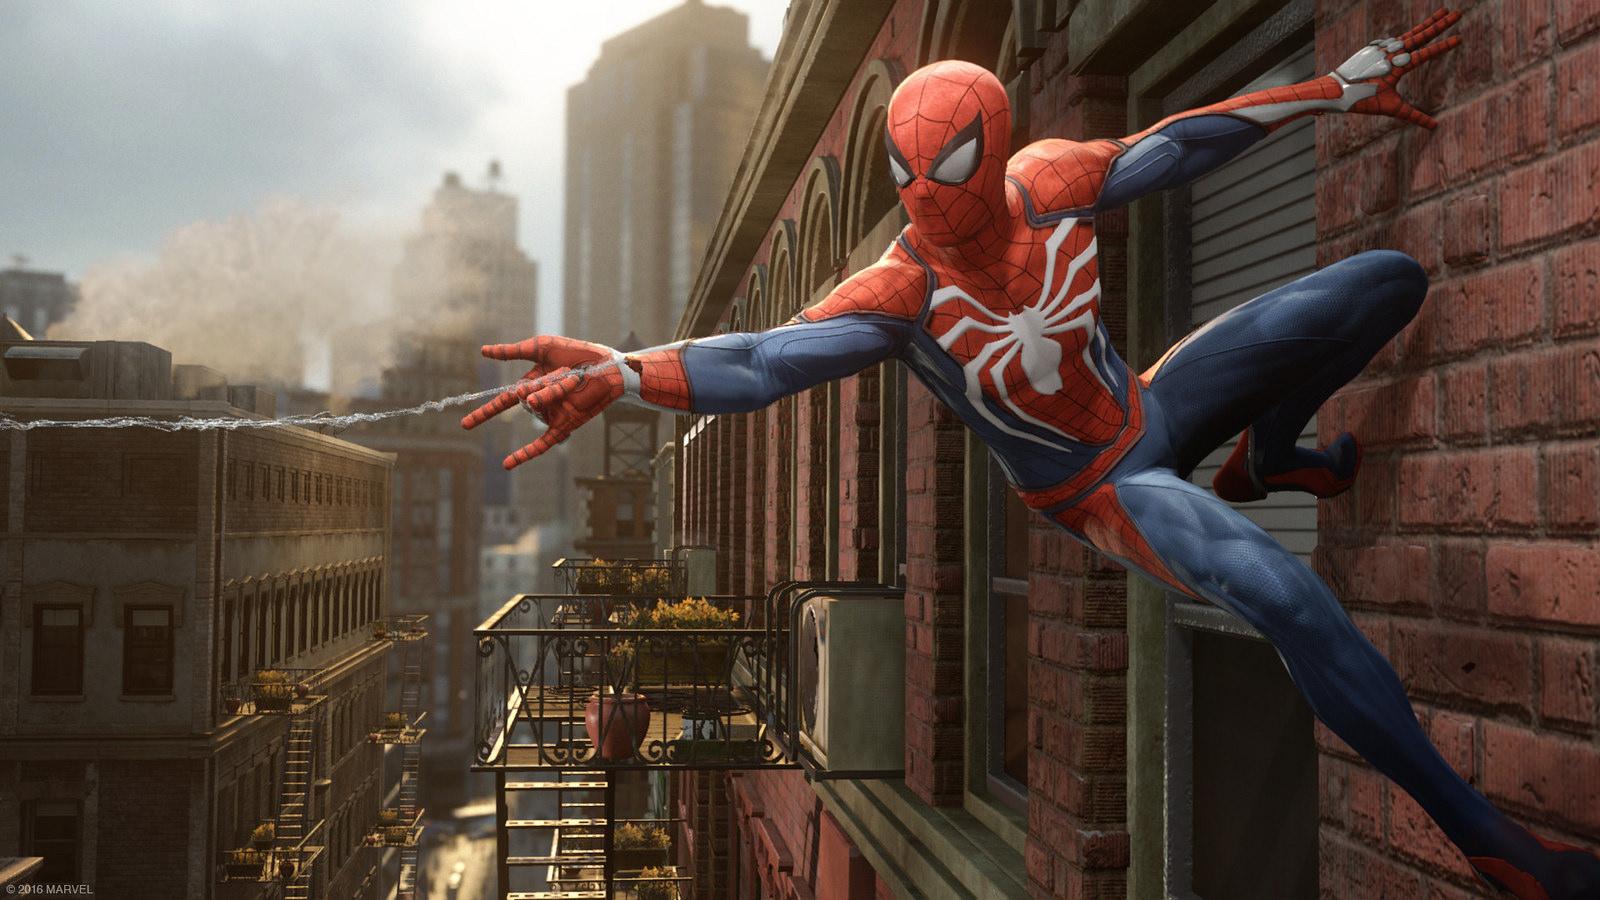 Spider-Man di Insomniac Games è esclusiva PlayStation 4